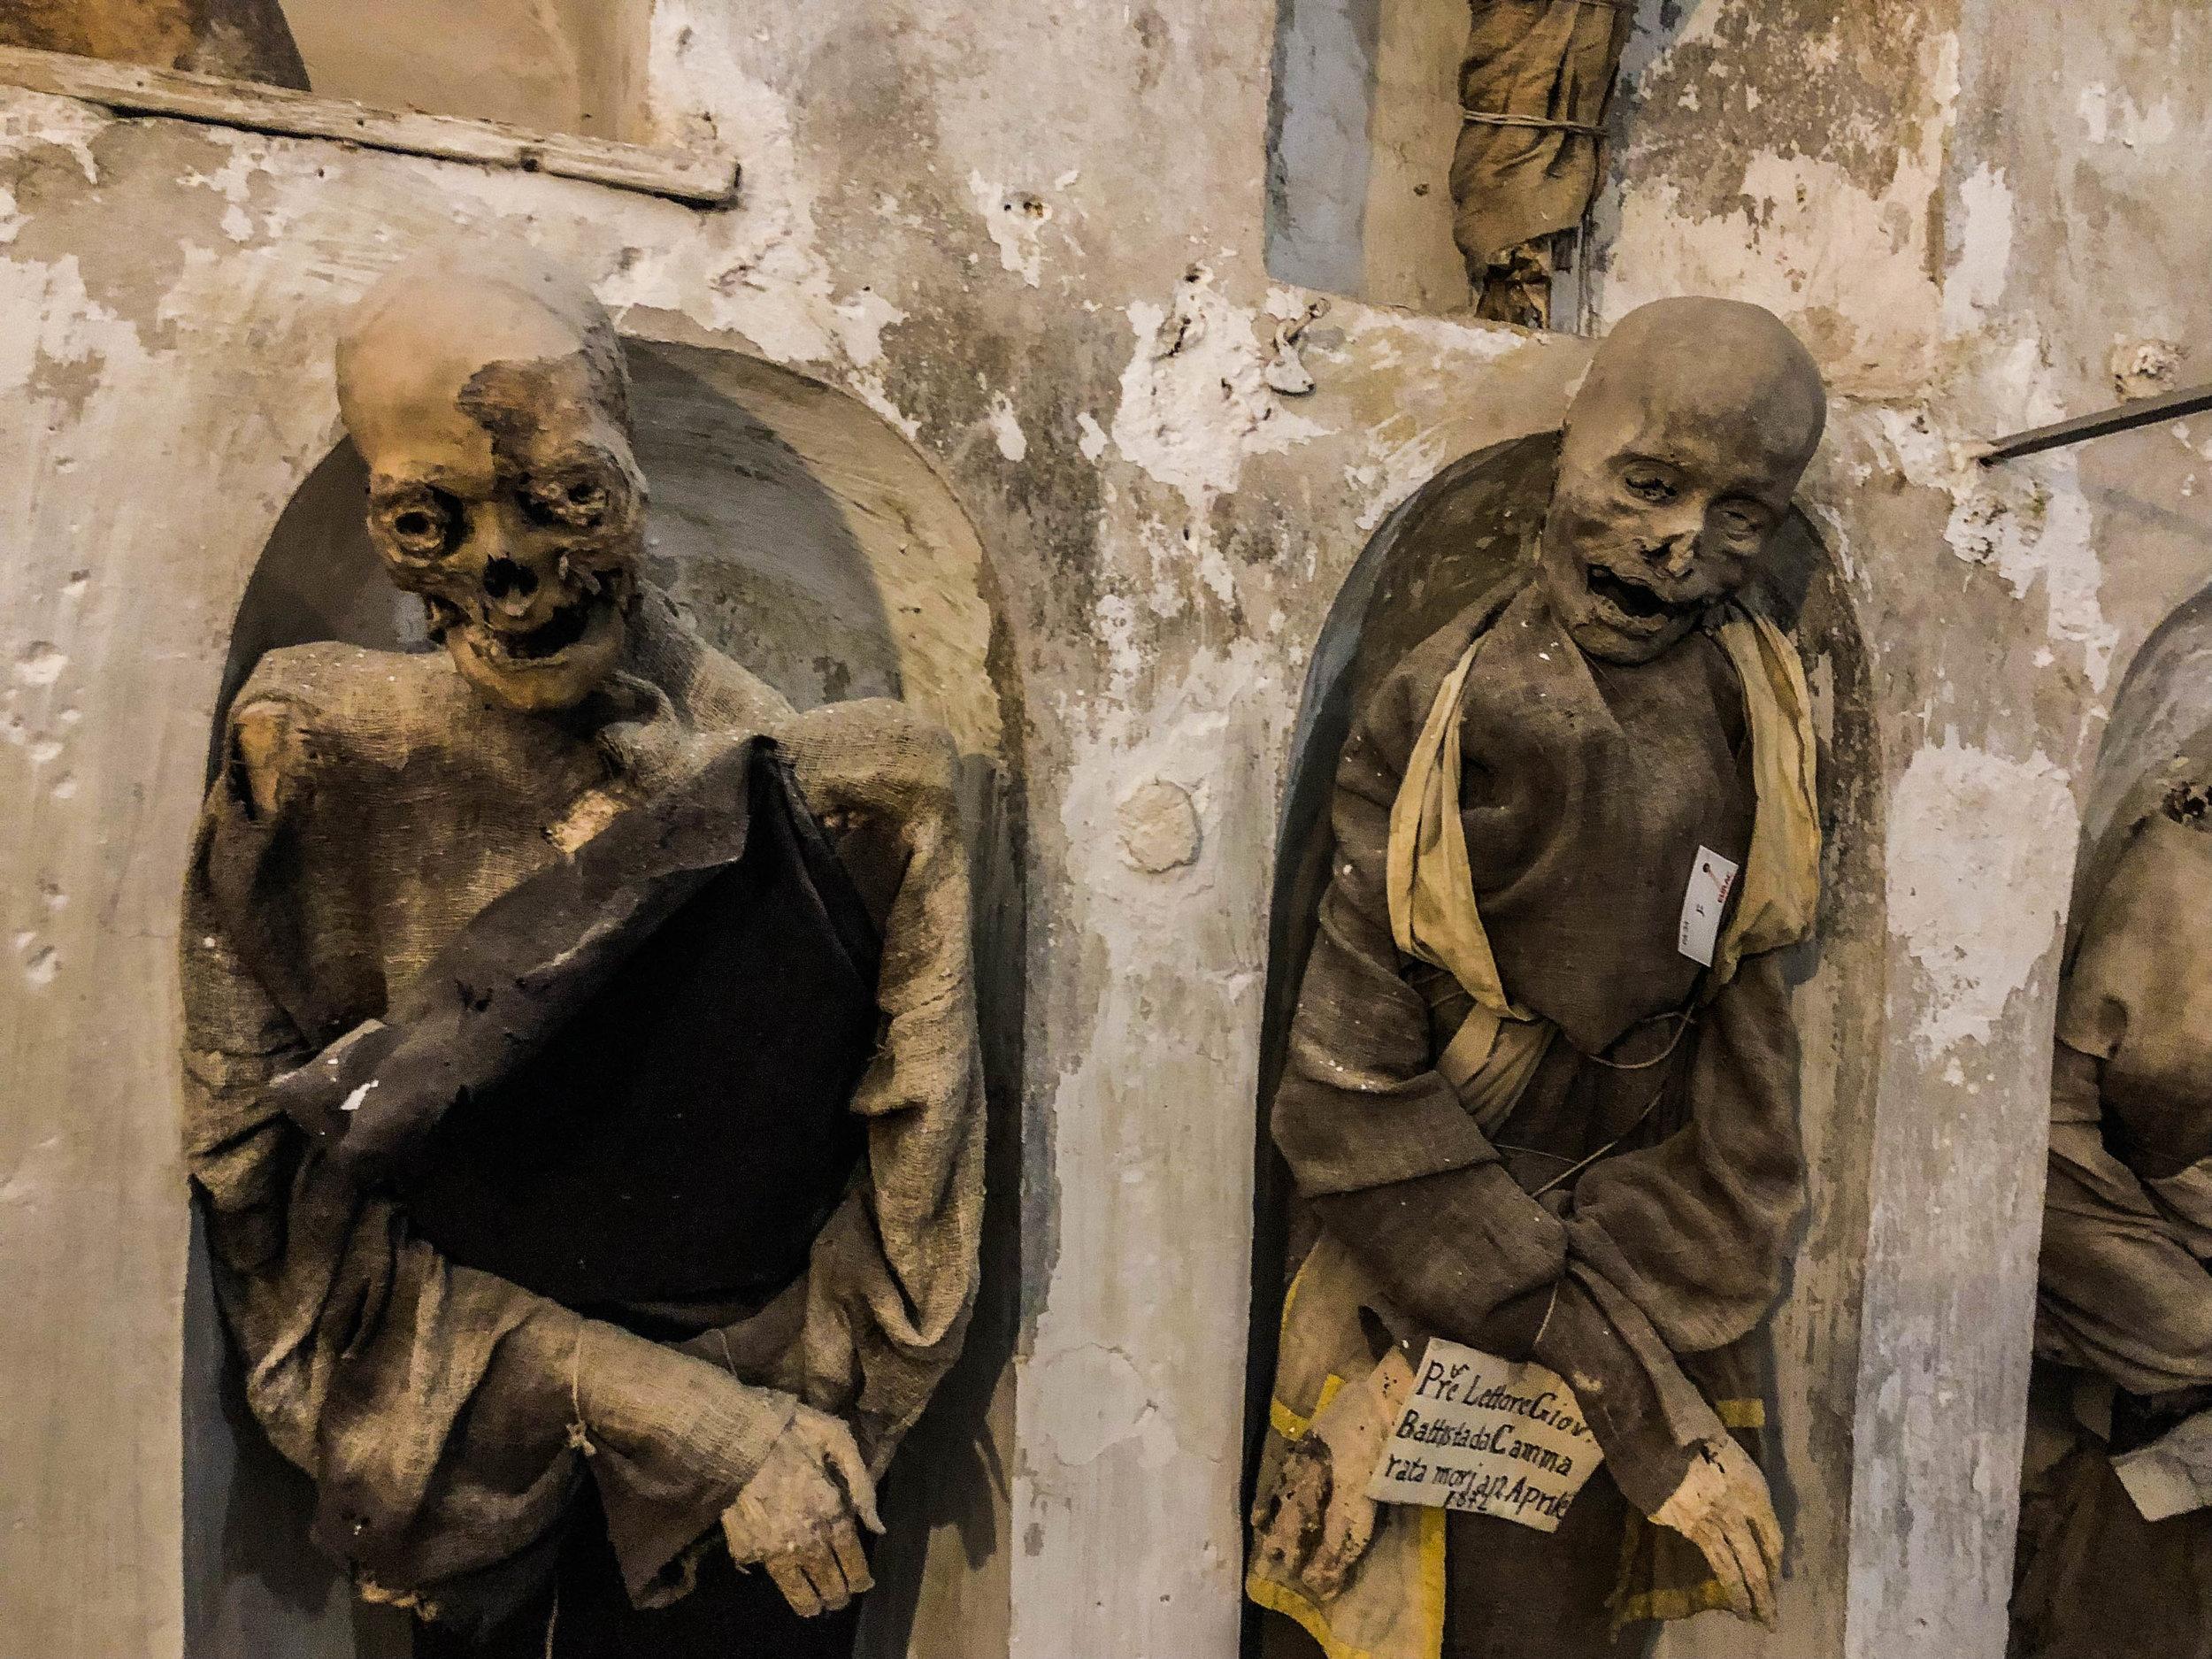 capuchin-catacombs-bodies-palermo-6.jpg